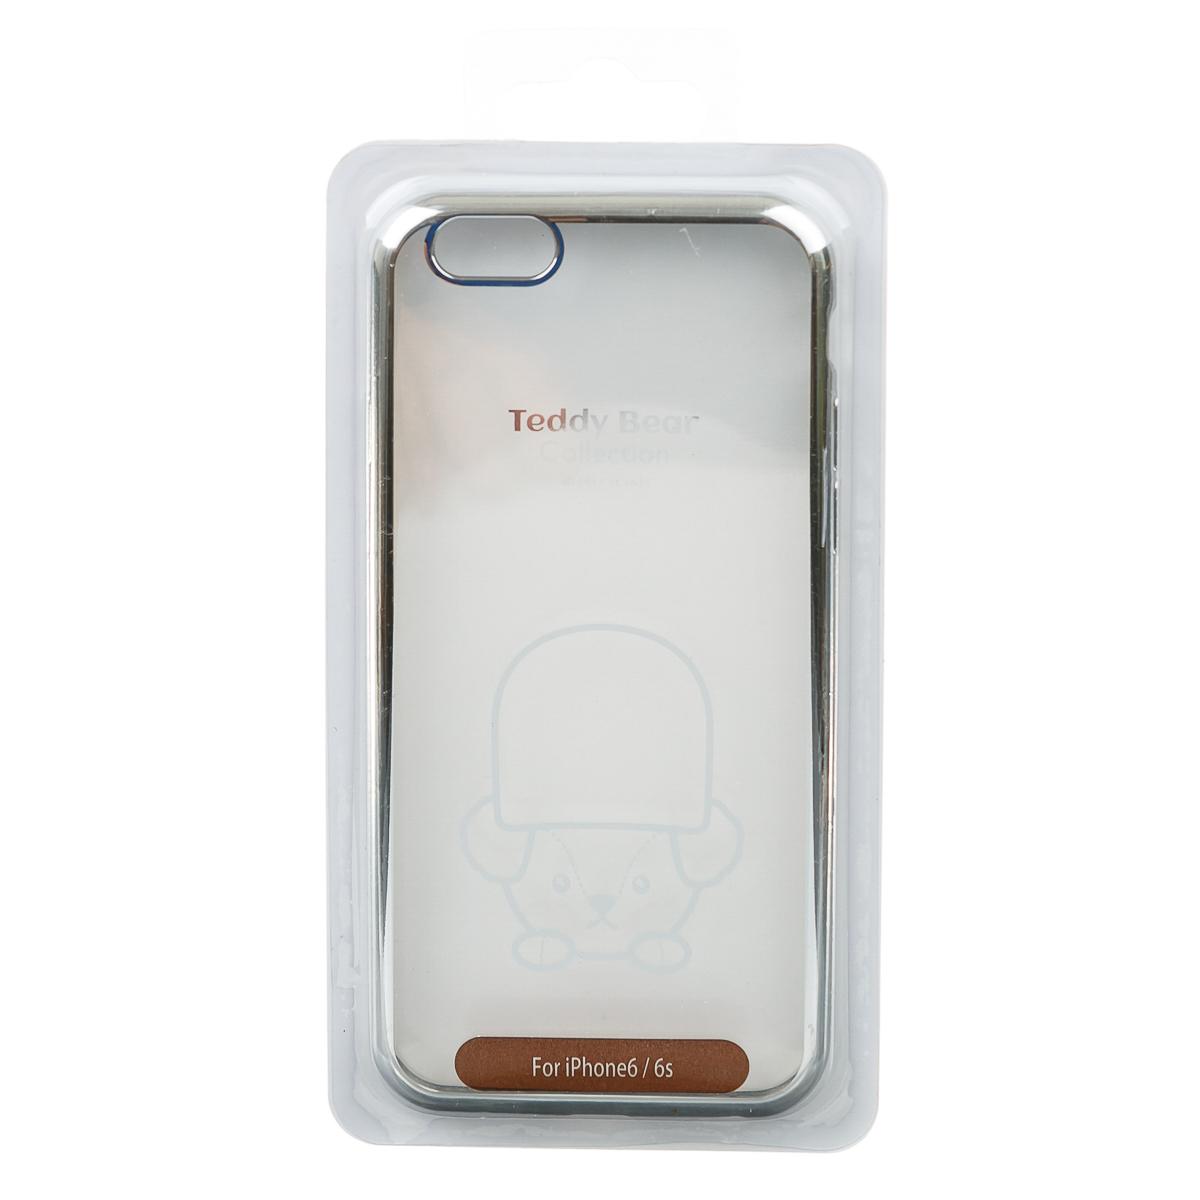 Чехол для iPhone 6 6S тедди прозрачный серебряный